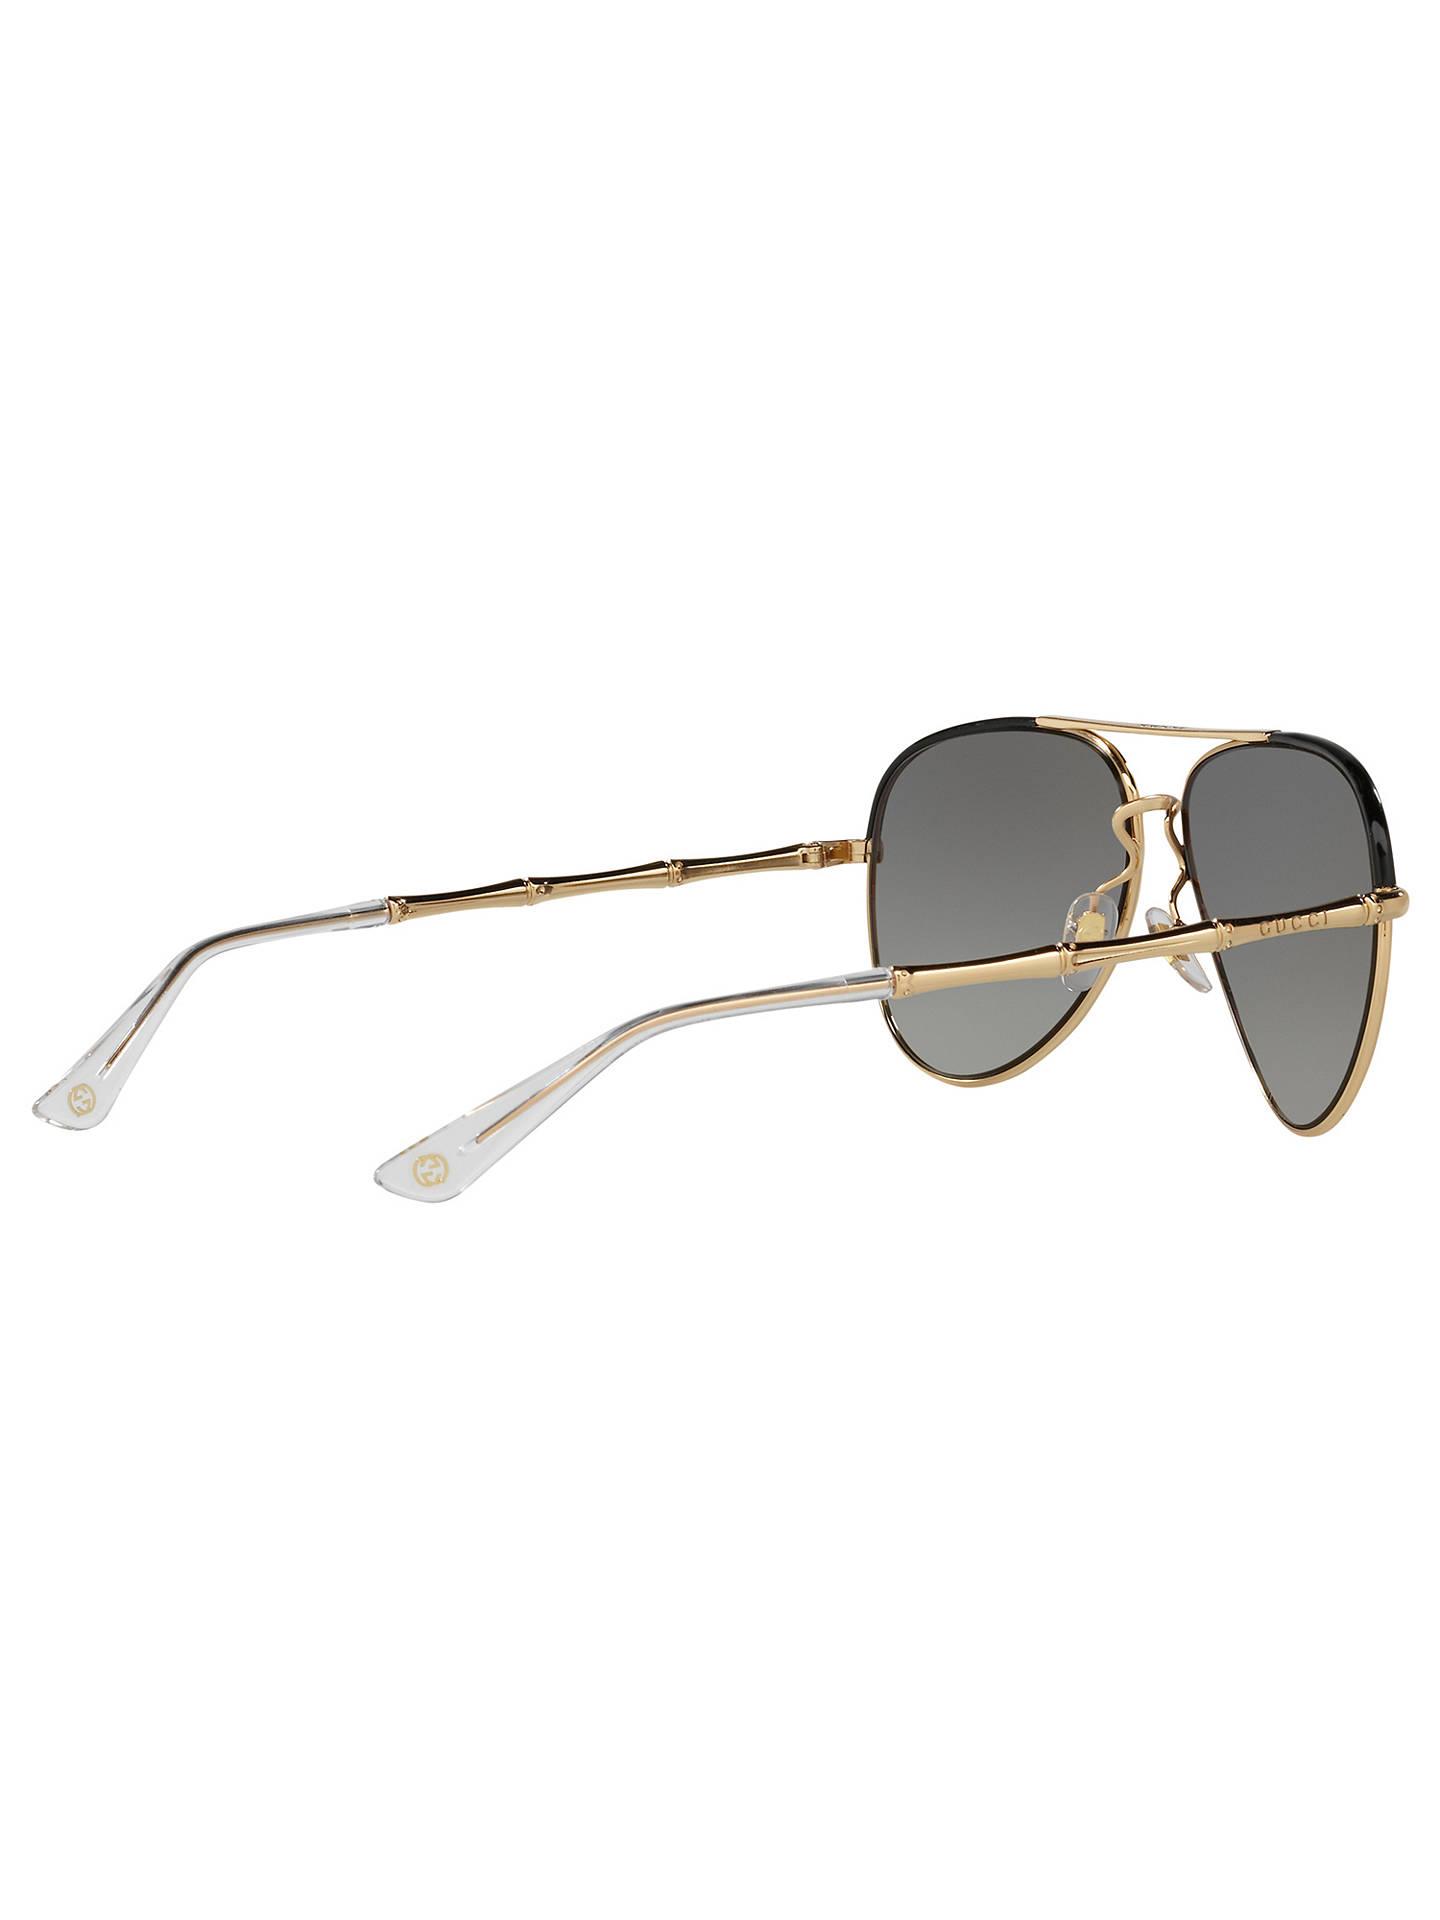 94df6eeb9cd ... Buy Gucci GG 4276 S Aviator Sunglasses